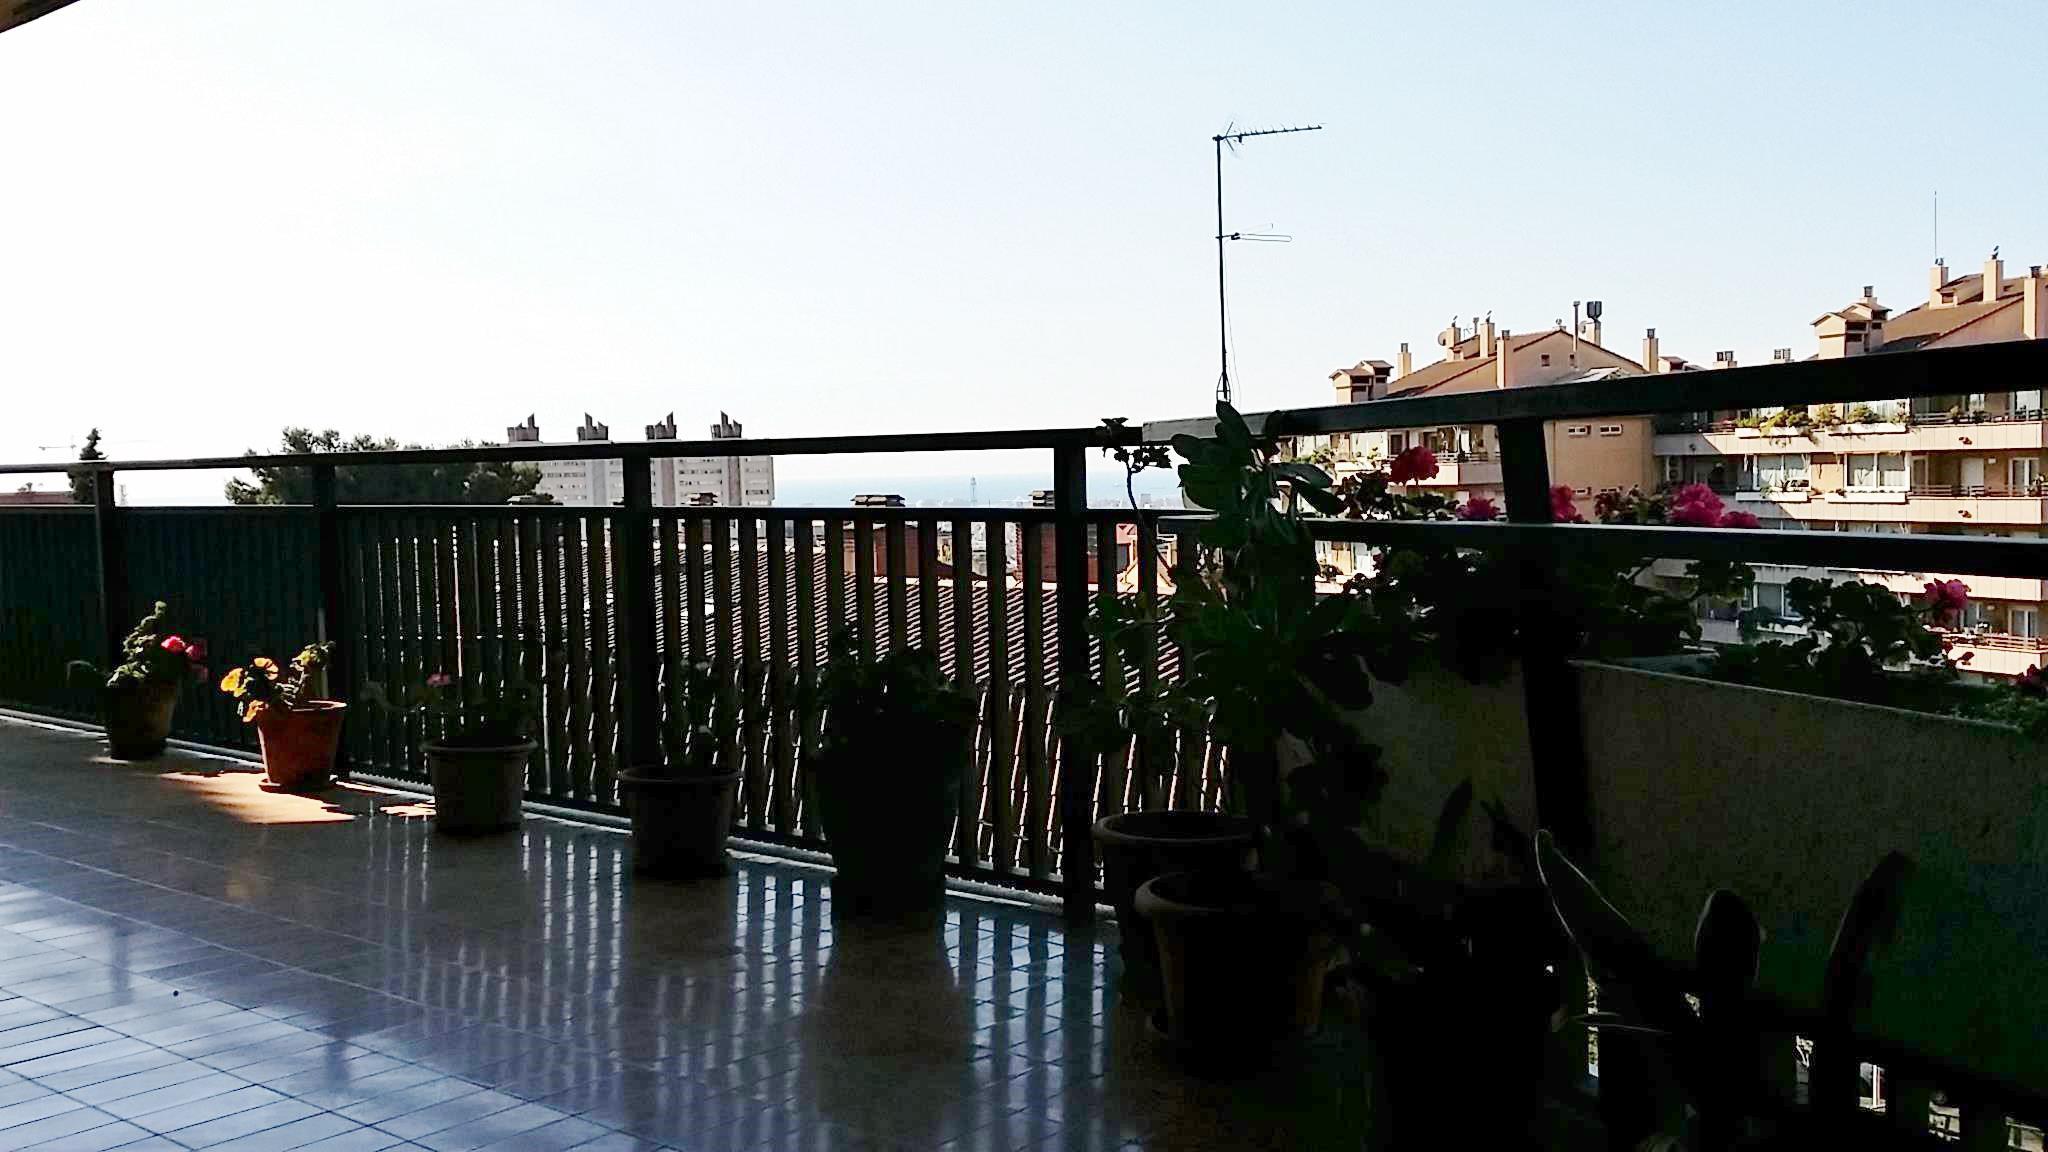 petit-appartement-de-vente-a-jt-avda-pompeu-fabra-la-salut-a-barcelona-226572215